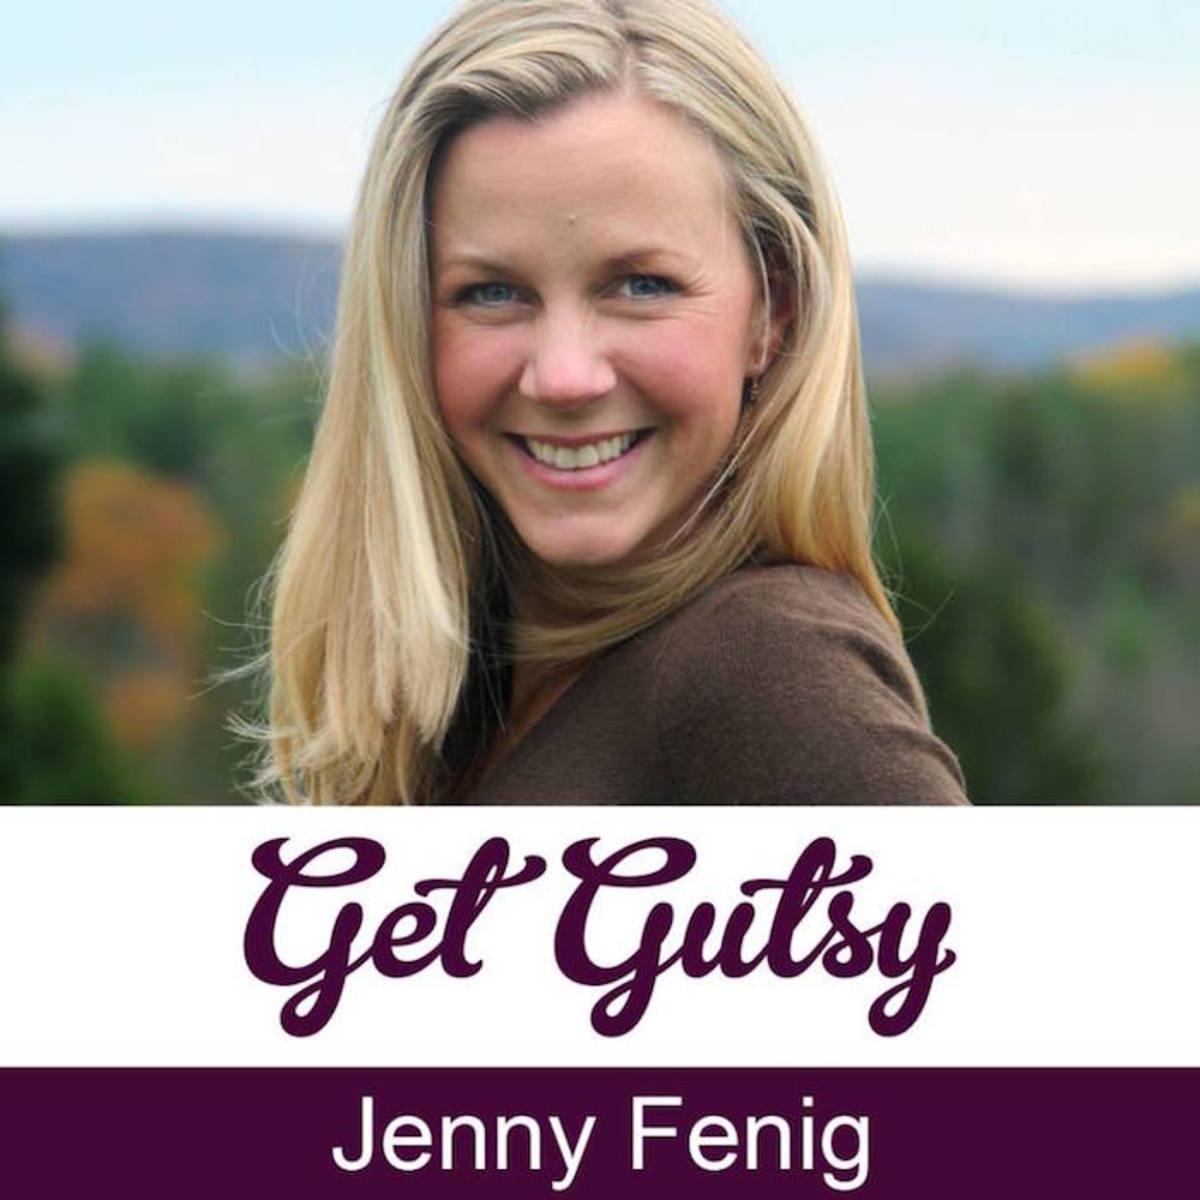 Fit Mom Profile: Jenny Fenig